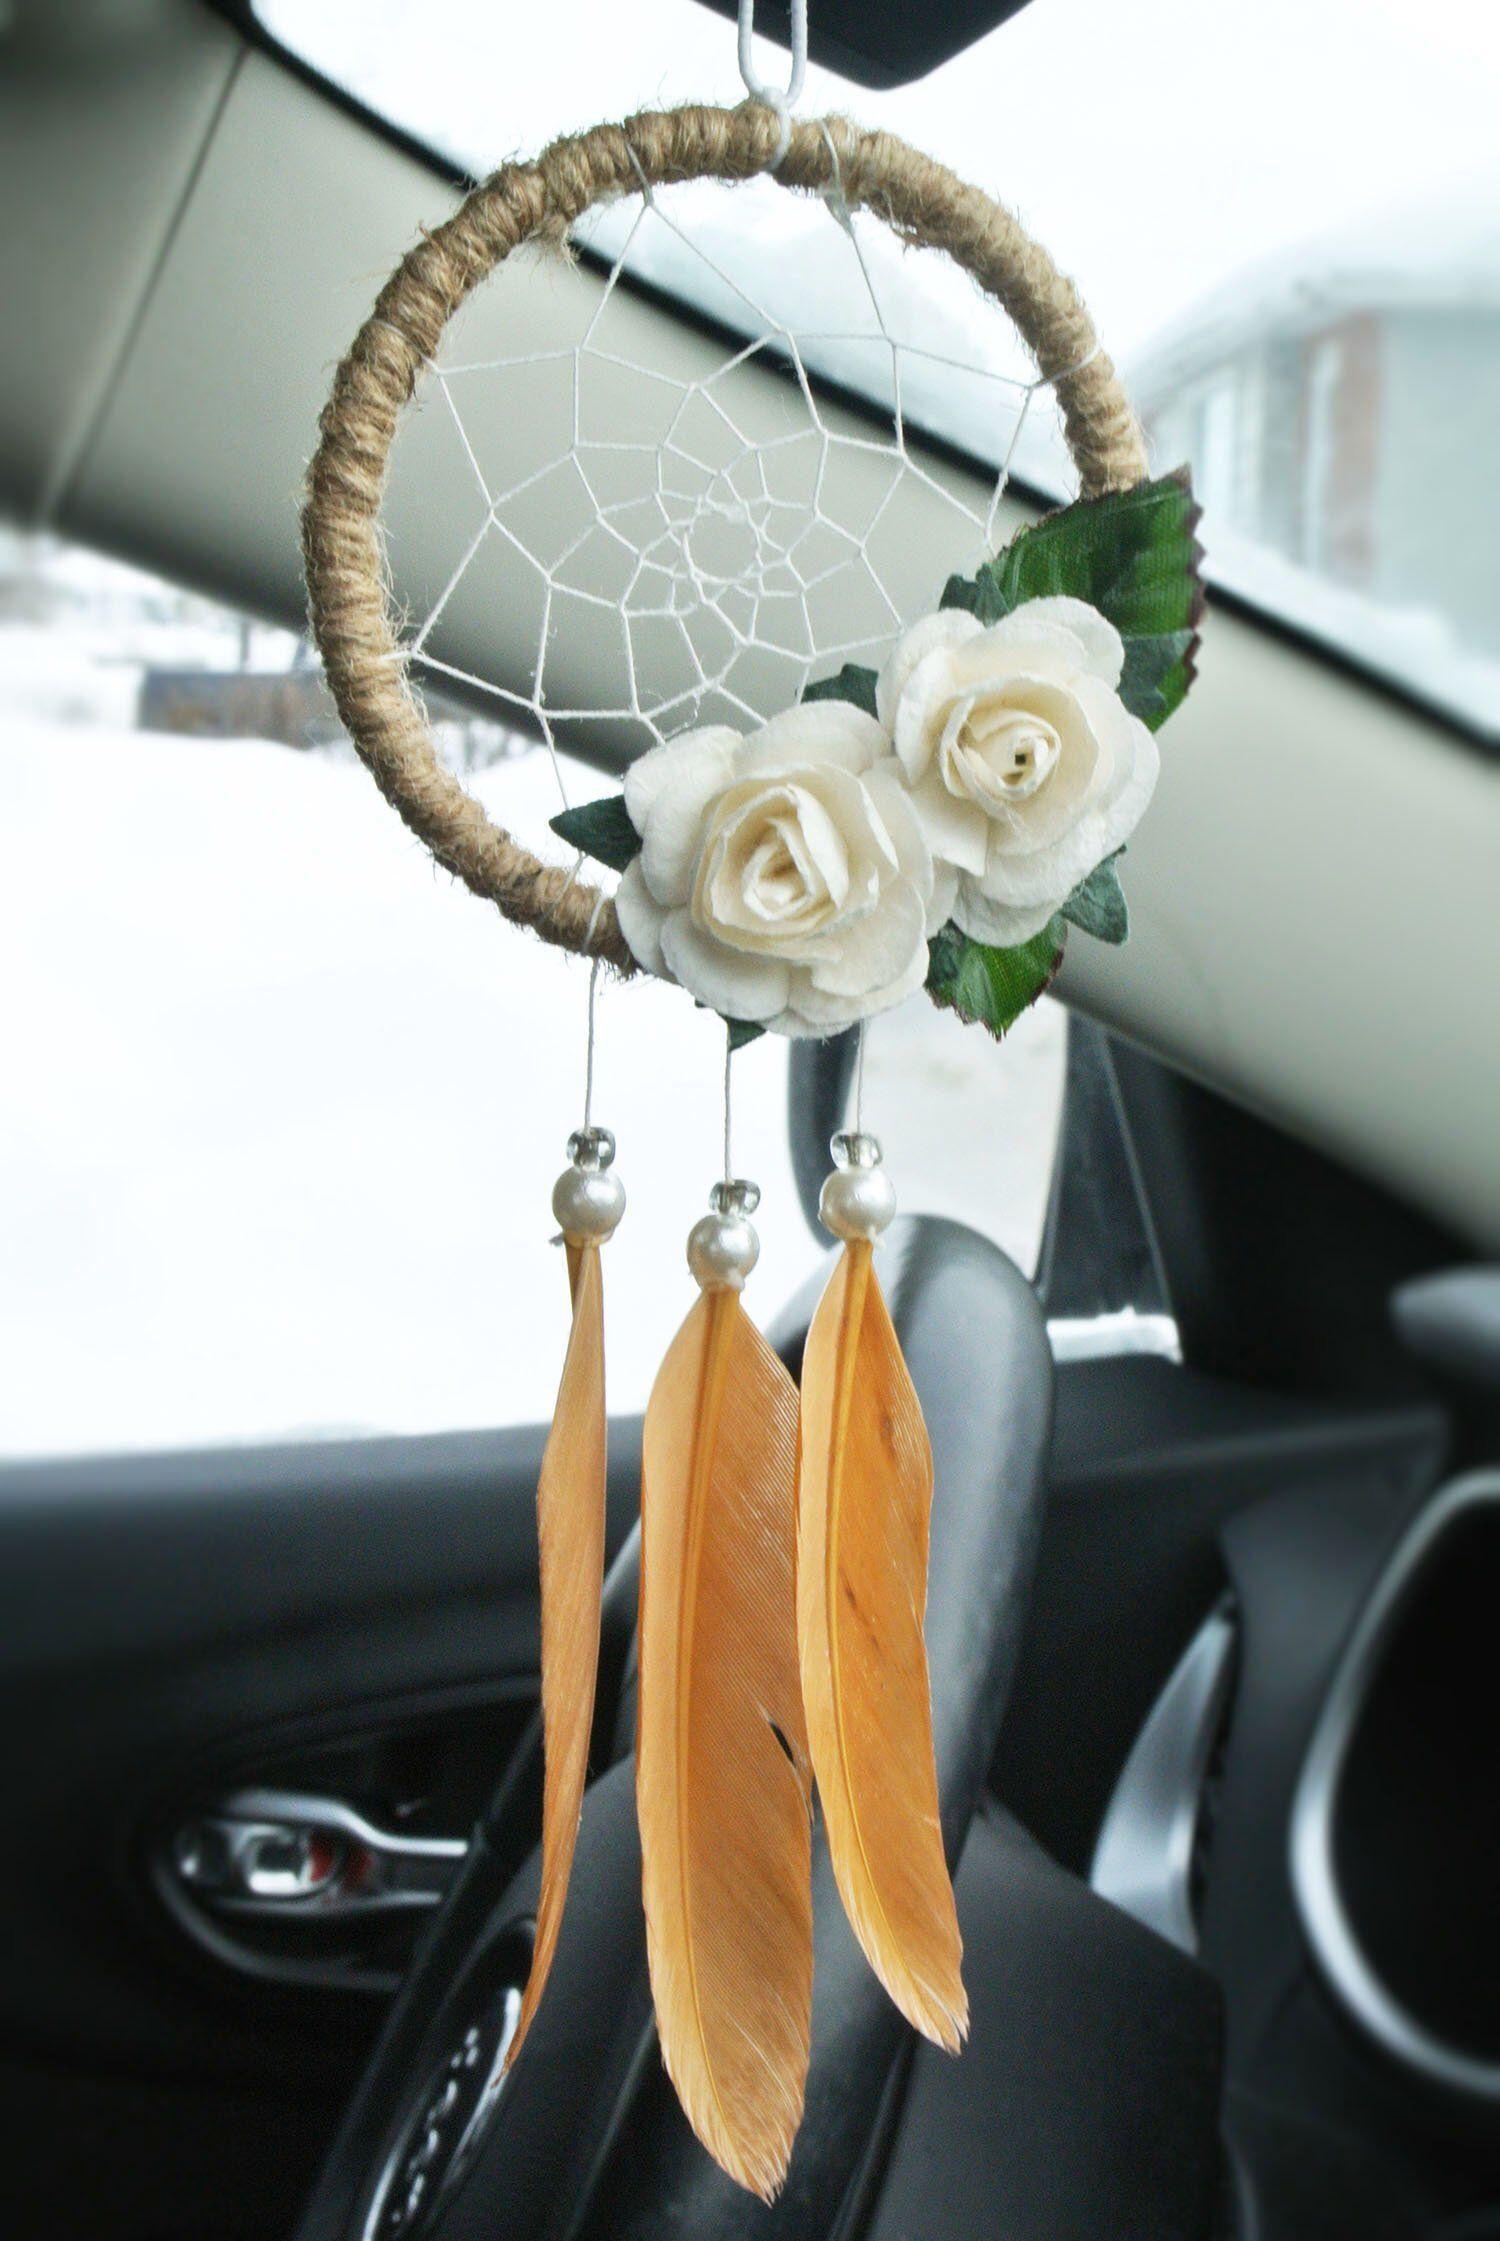 Handmade Crochet Fiat 500 Mirror Hanging Car Decoration Accessory Blue Design